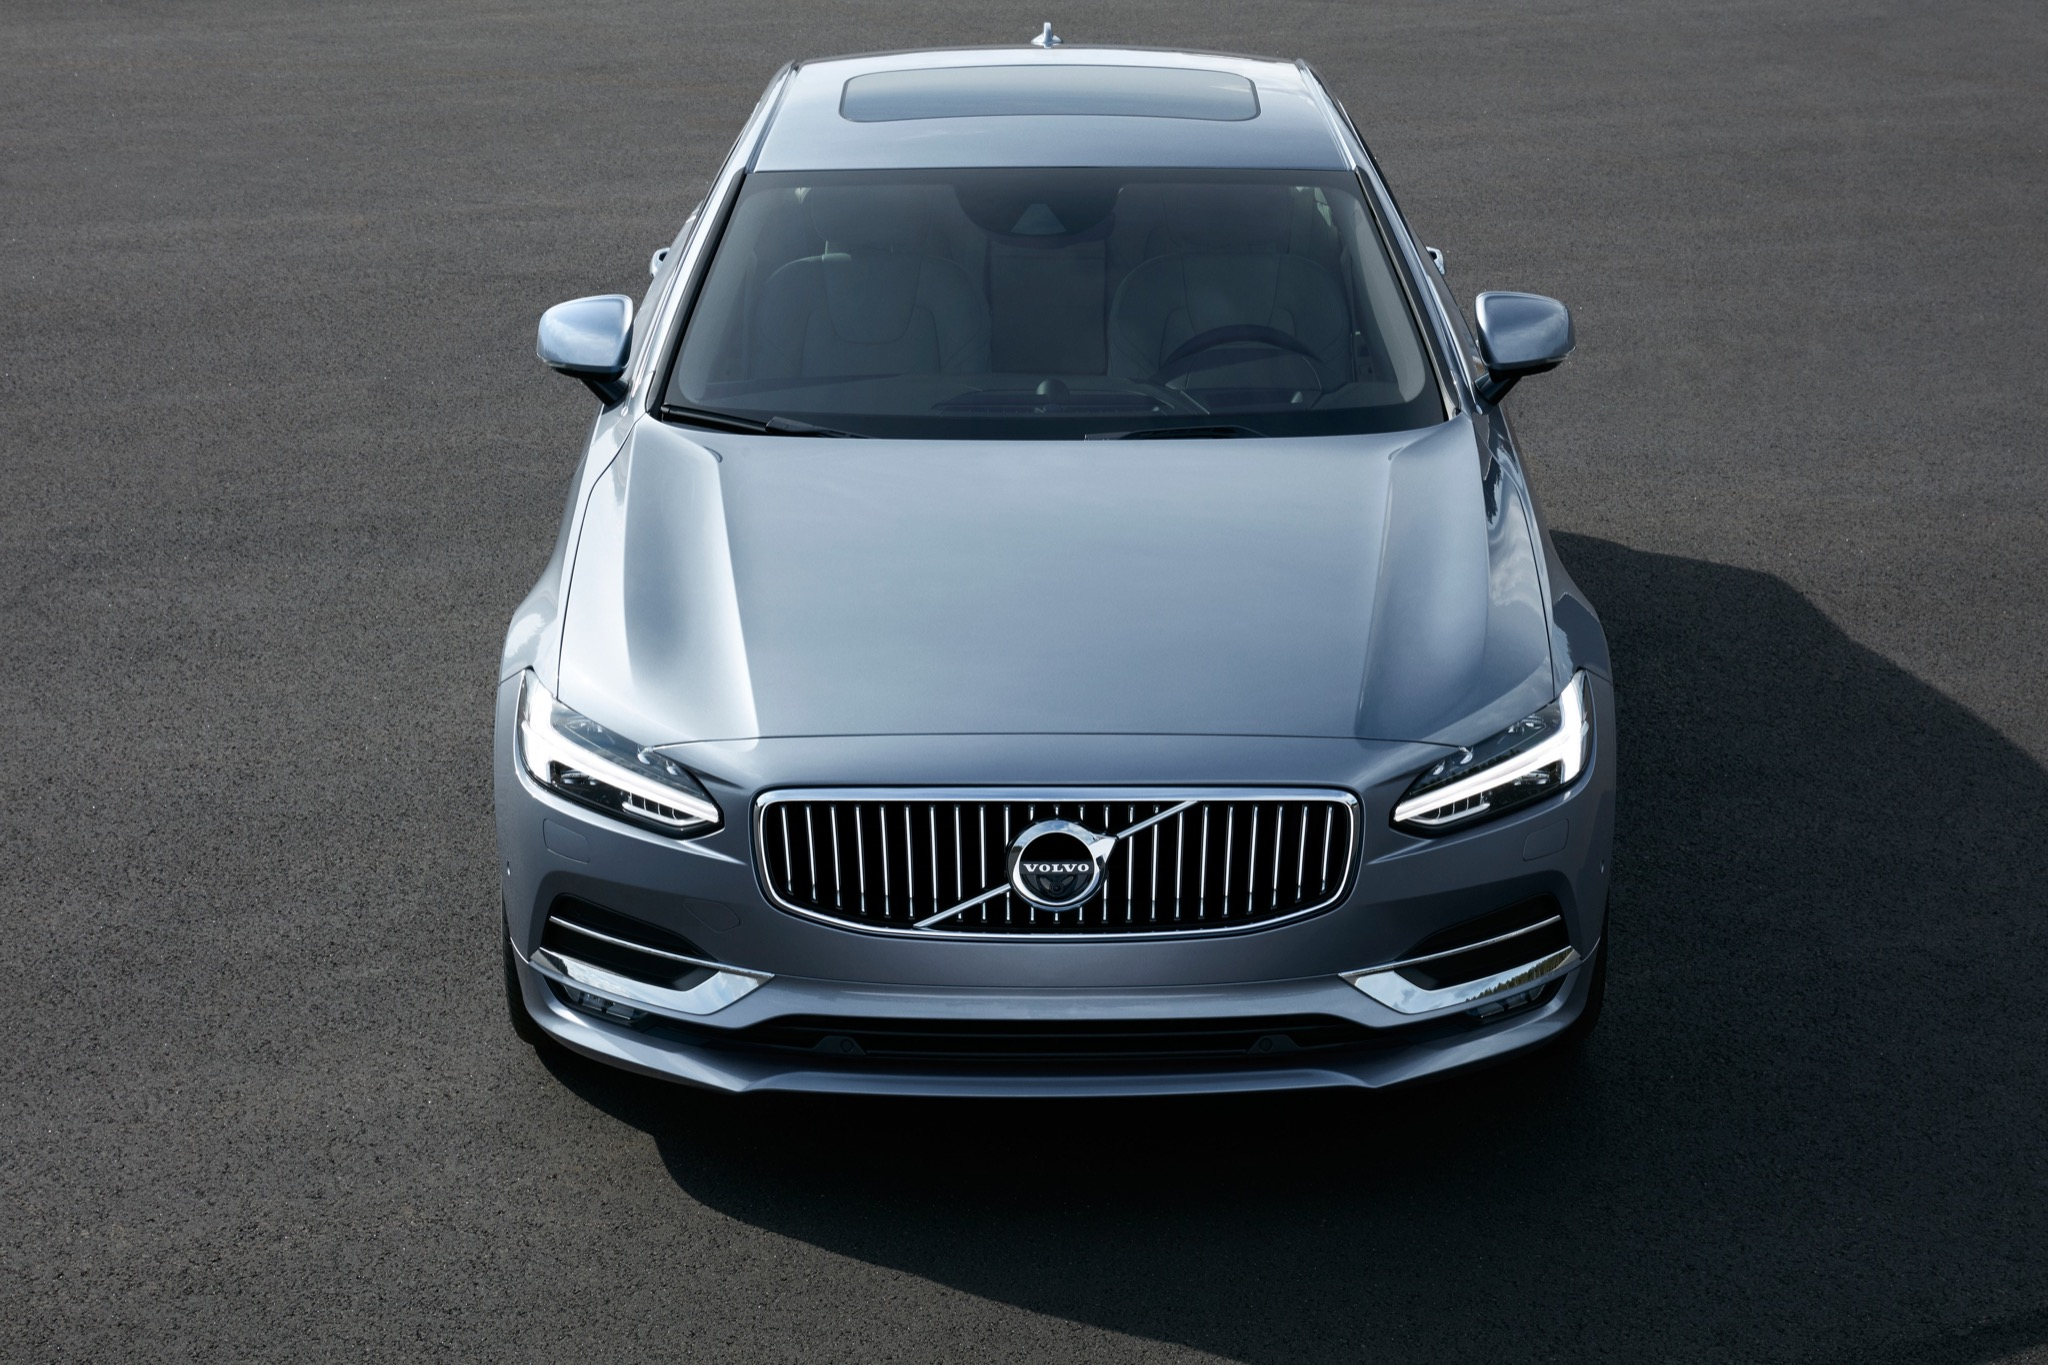 VolvoS90 11